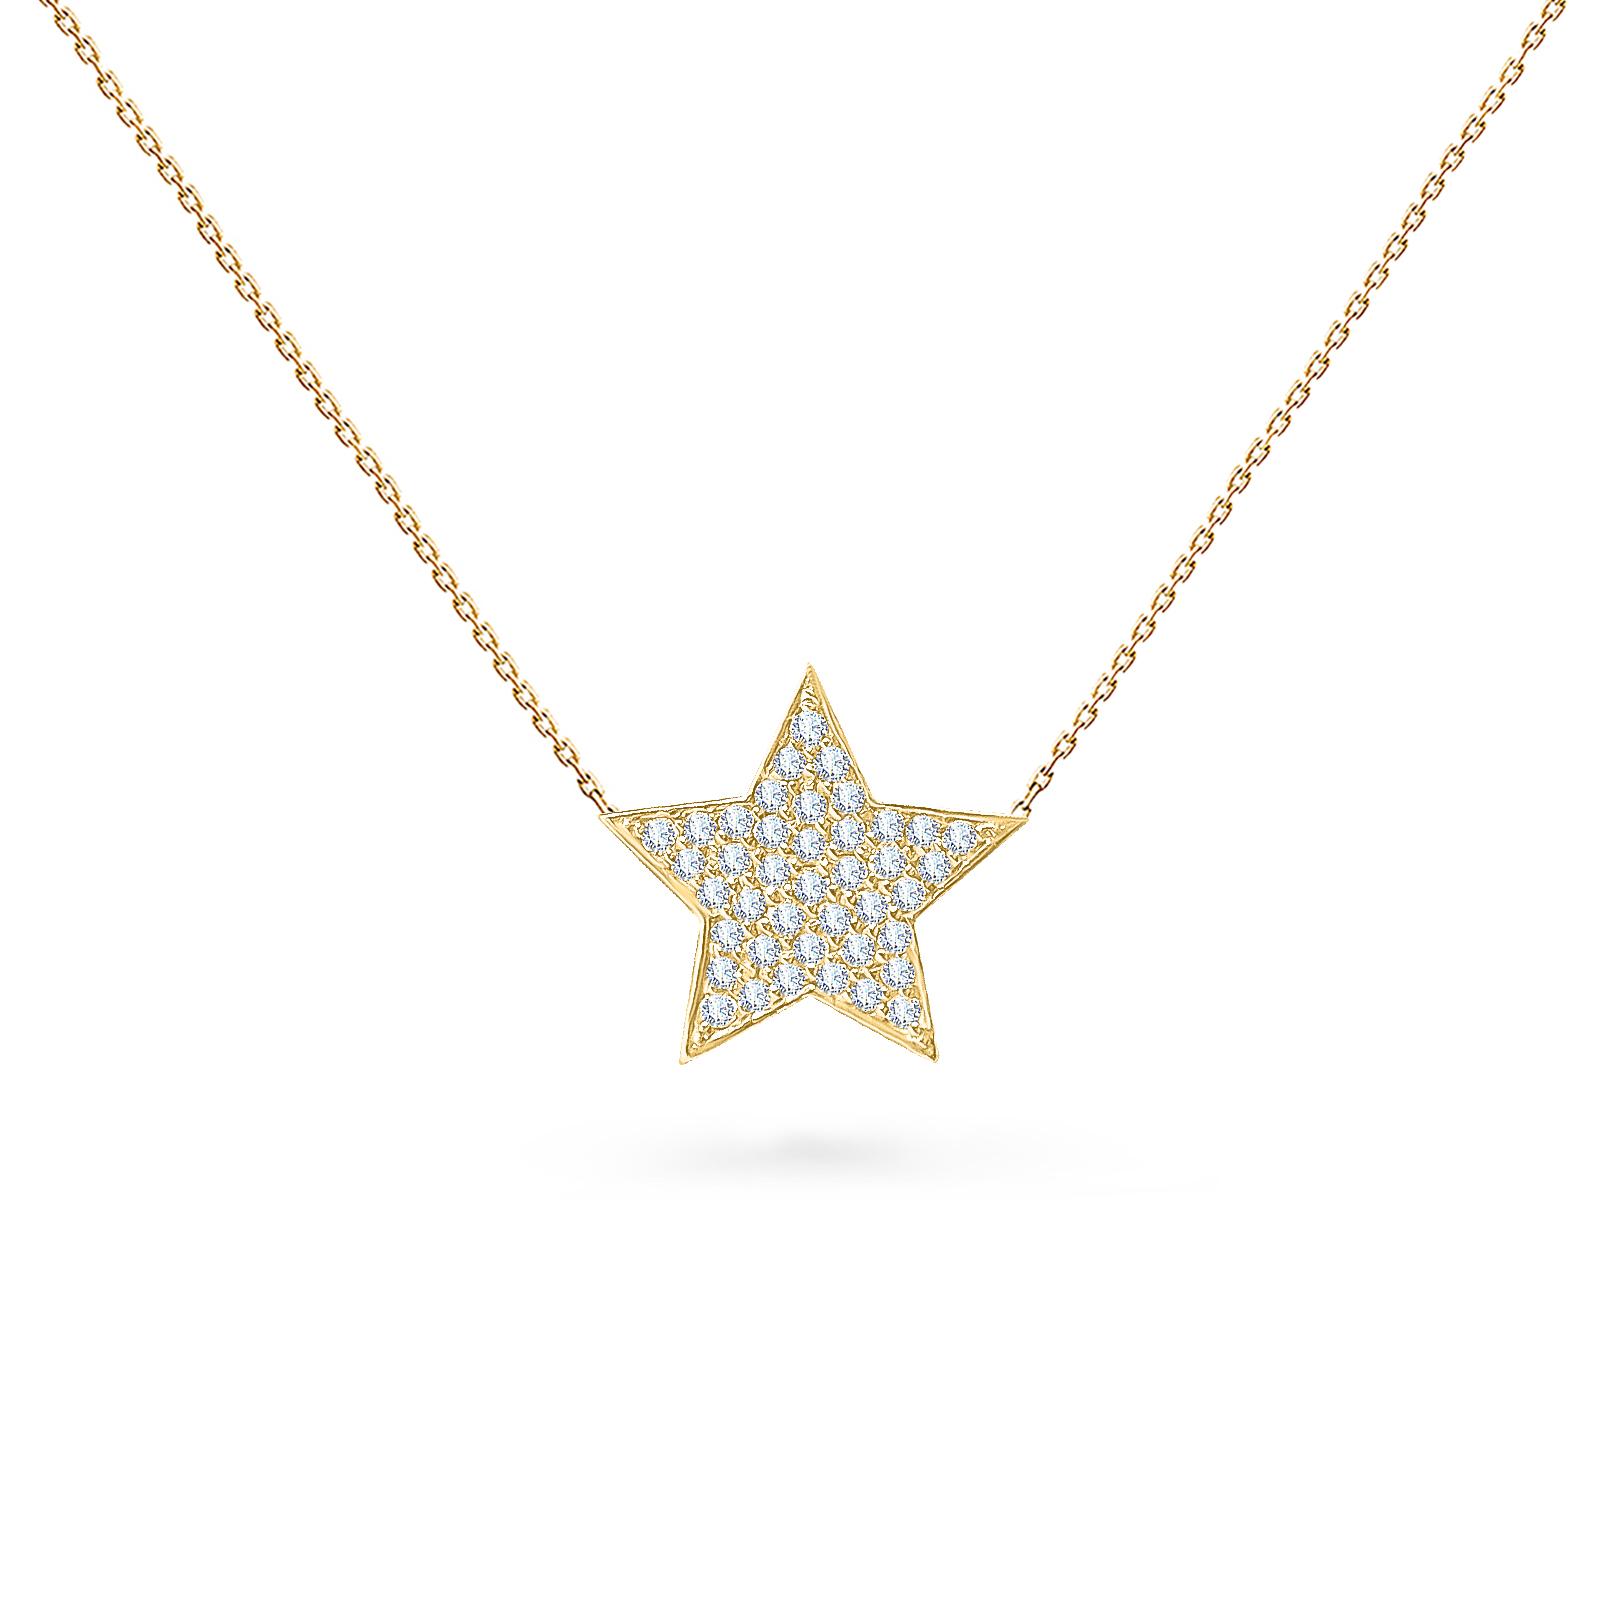 N-STAR-Y